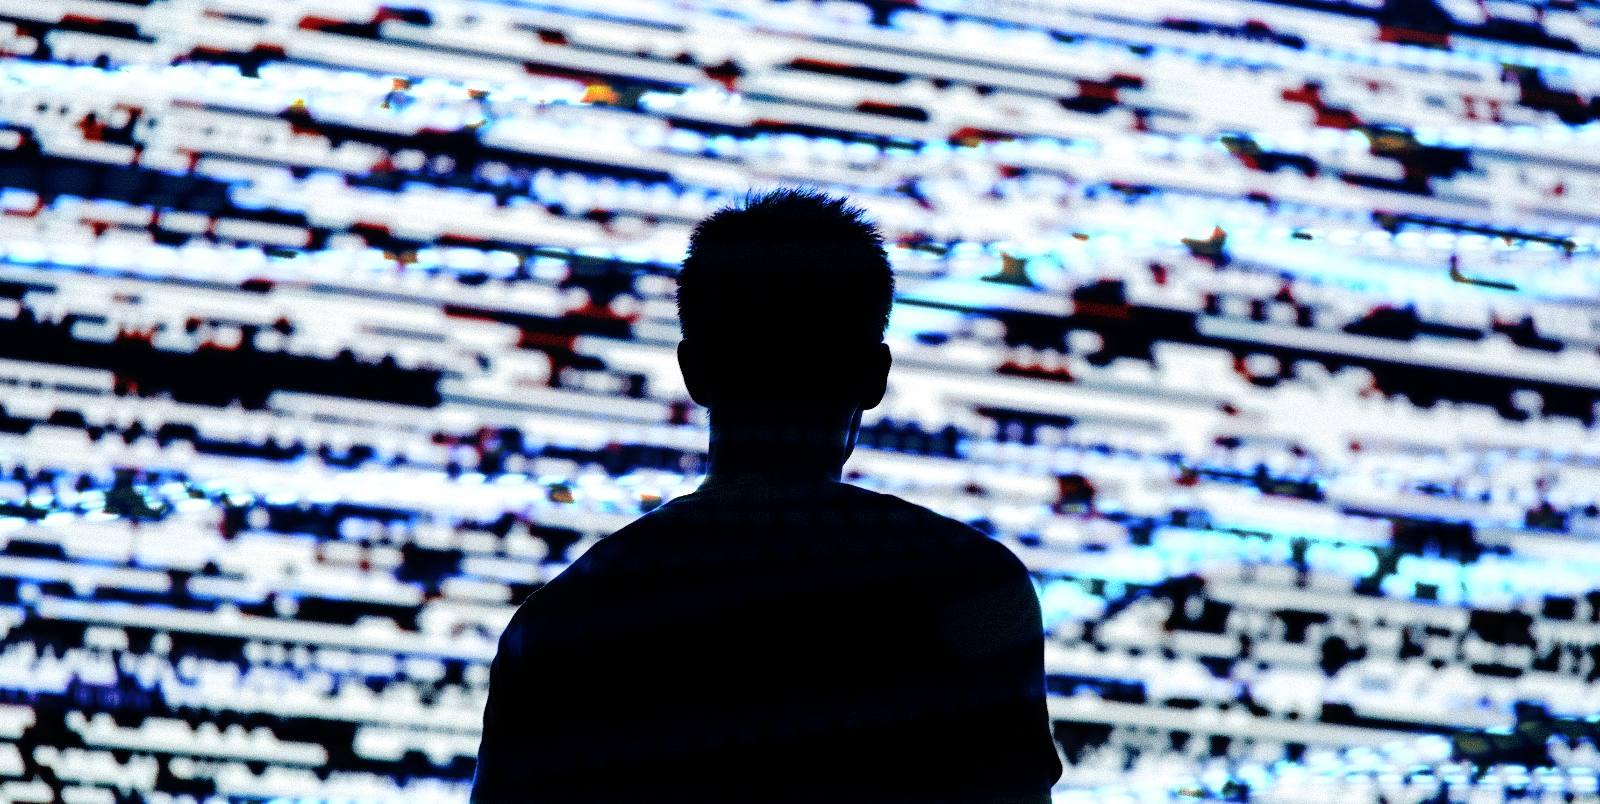 Google: North Korean hackers target security researchers again